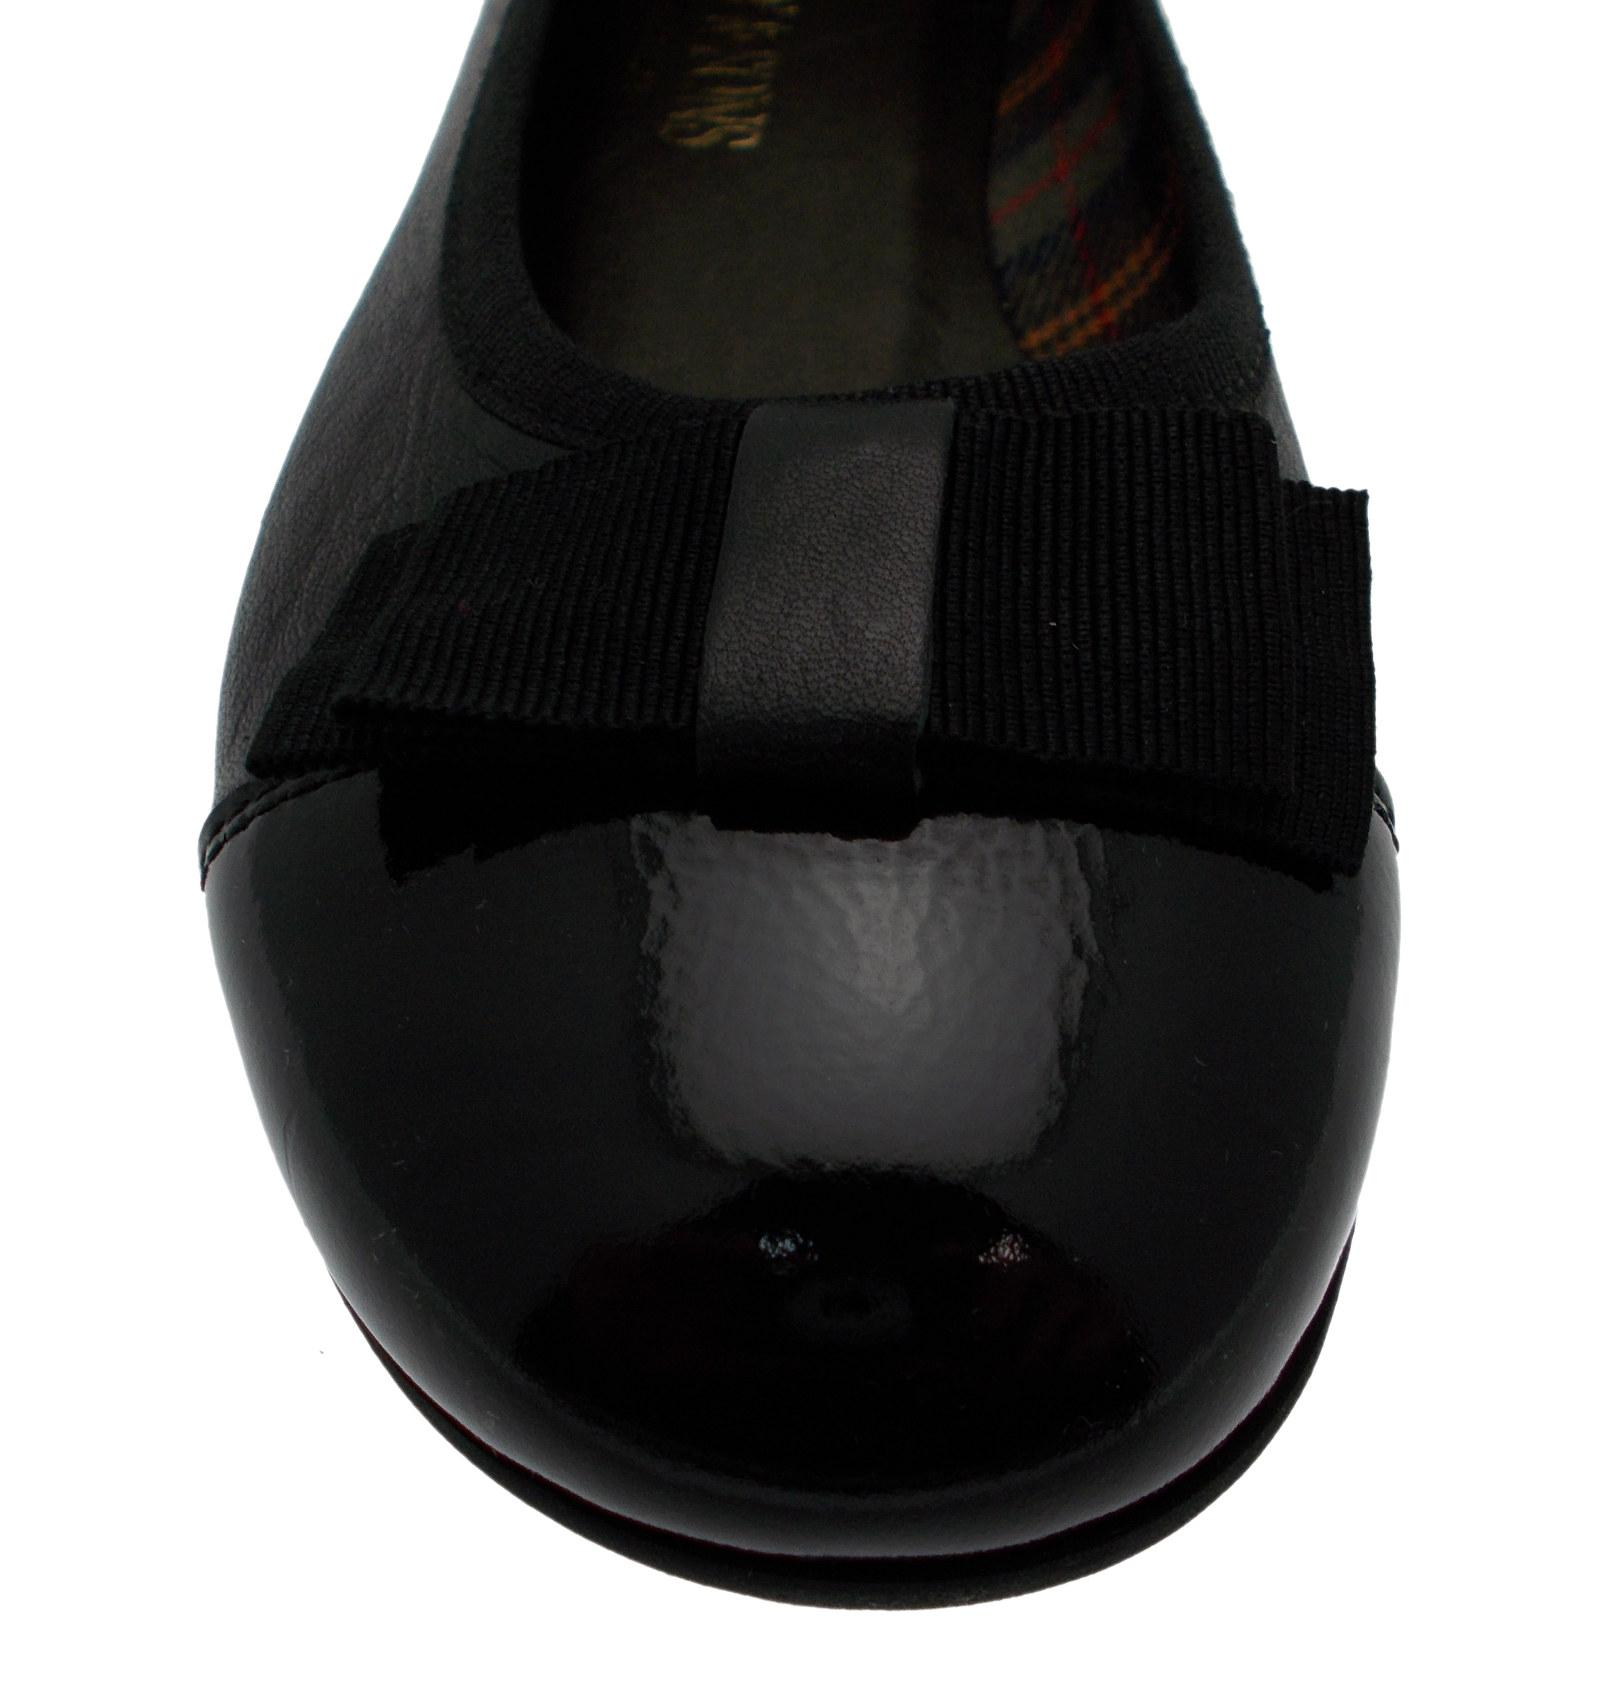 Paperina danser zwart R.P lakleer knoop art 1473 Calzaturificio R.P zwart f4b2e4